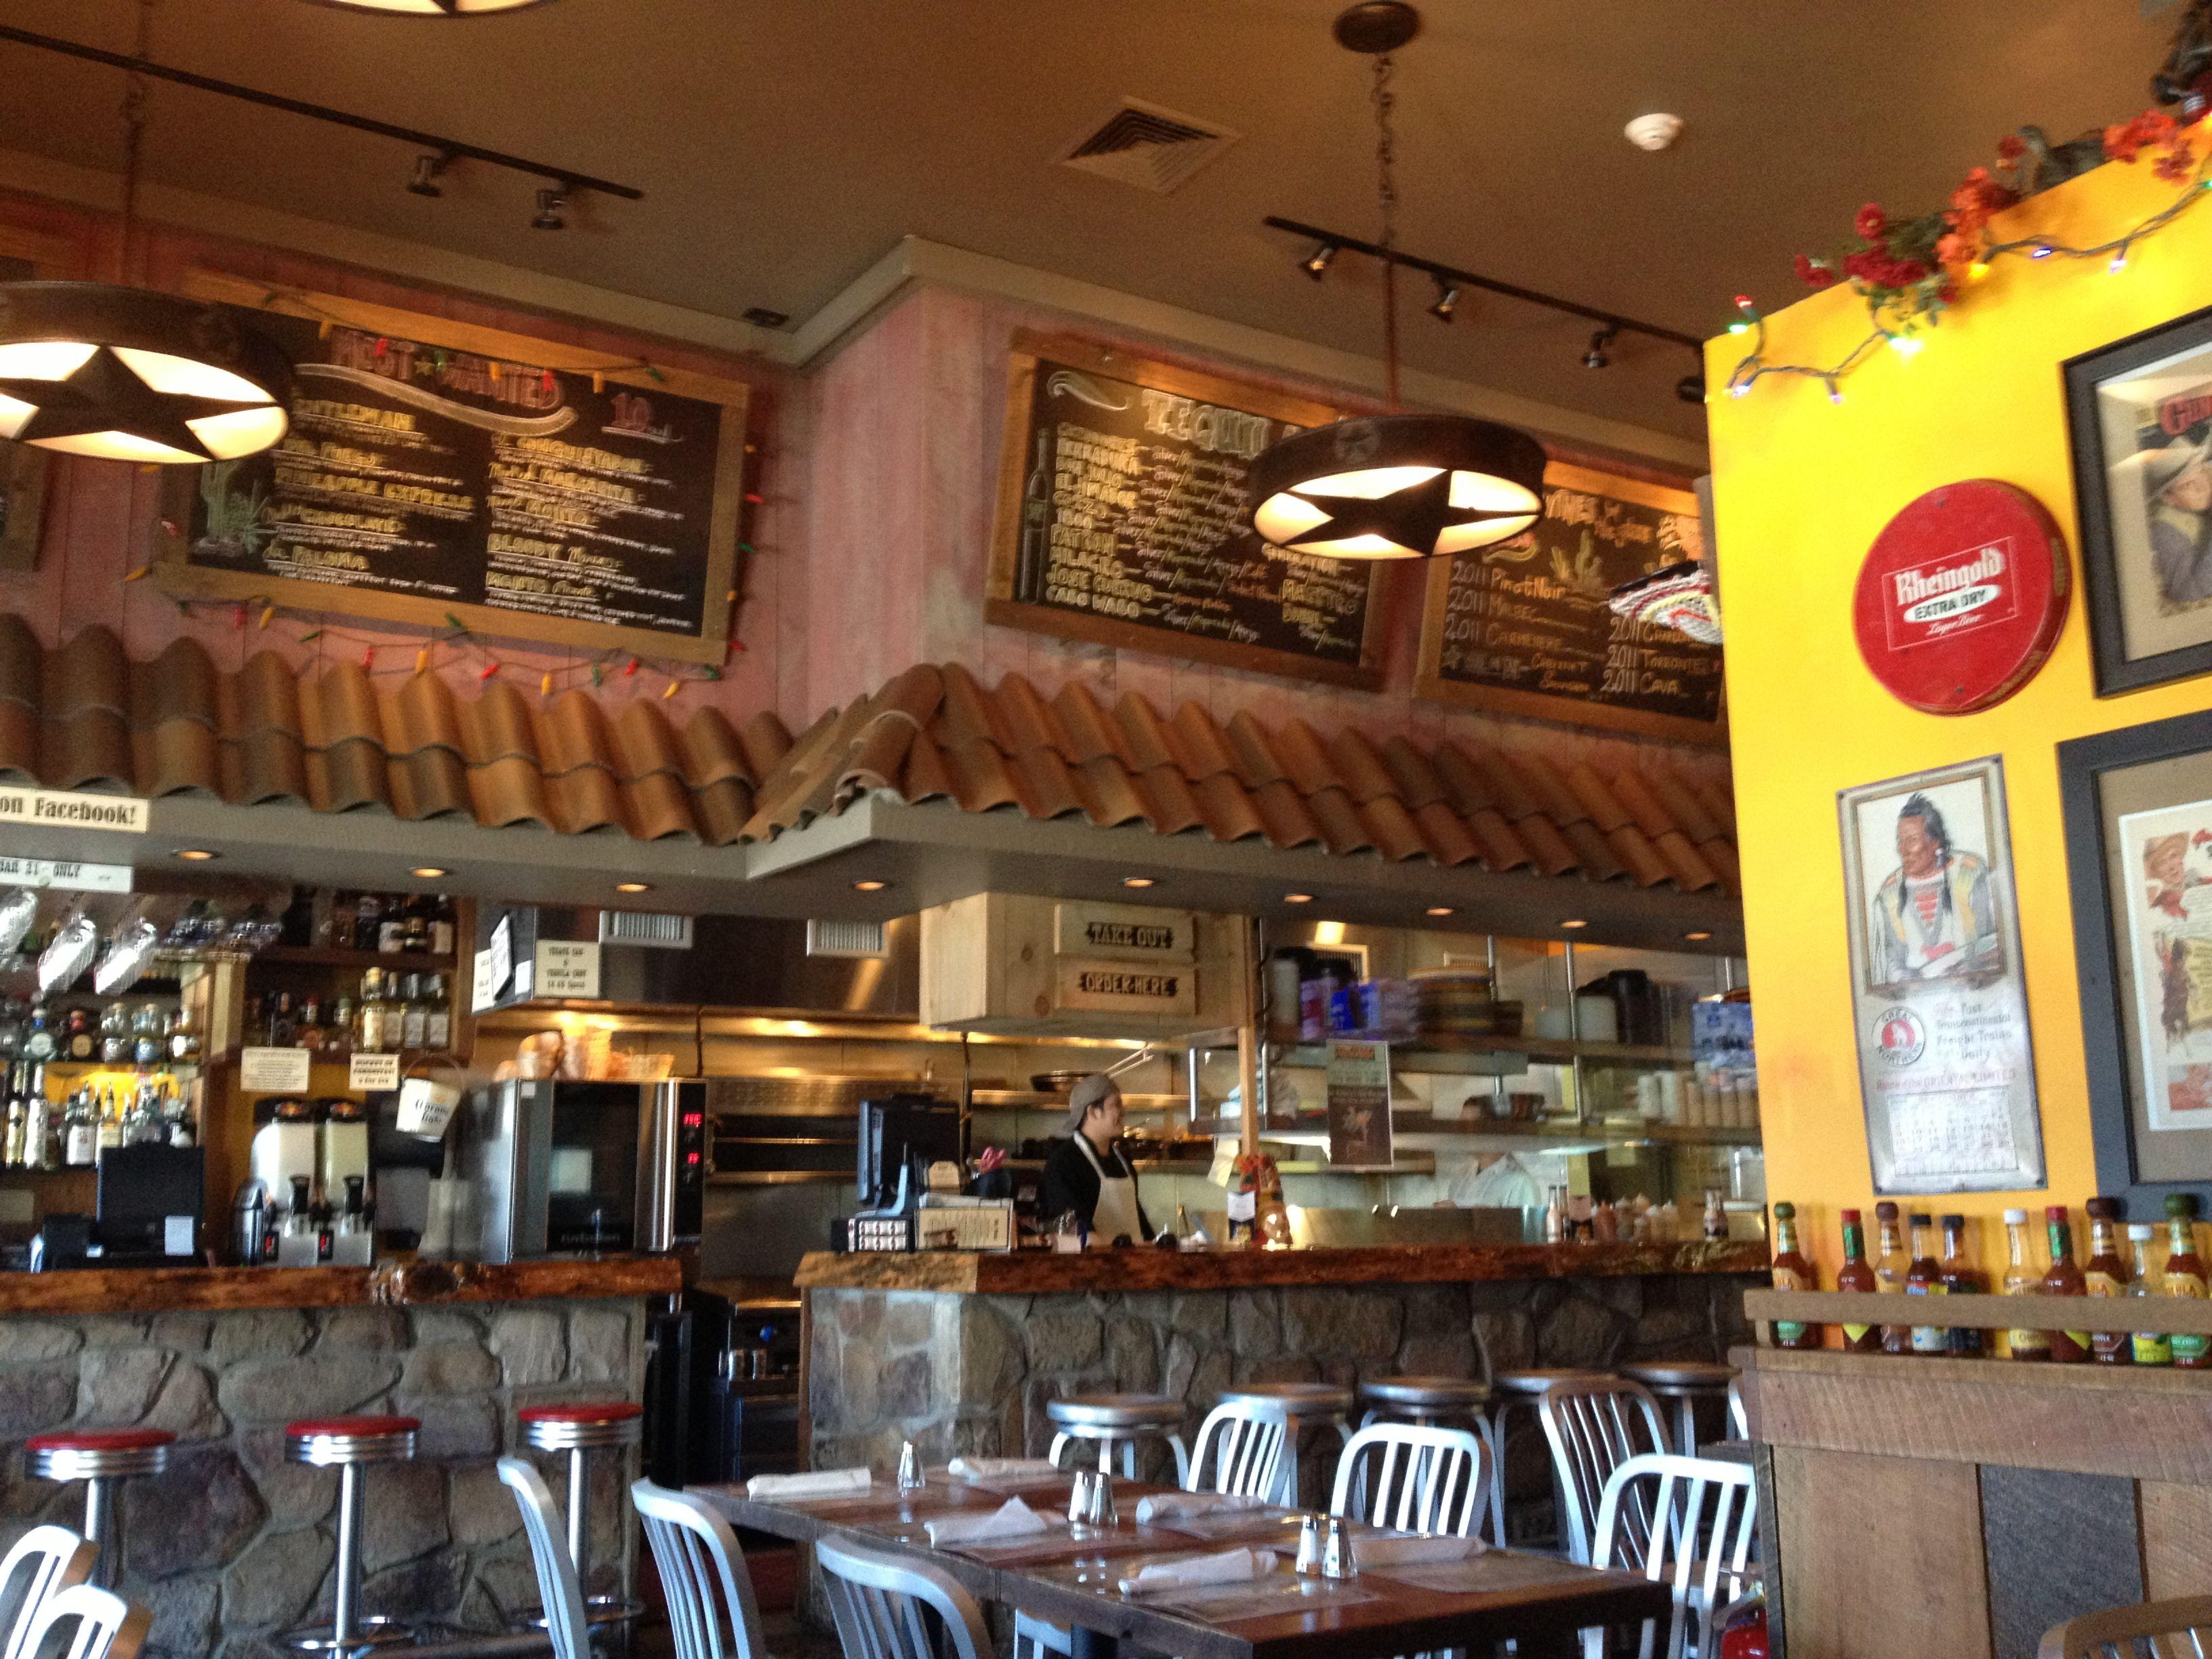 Del Fuego Restaurant prior to its Saturday lunch rush